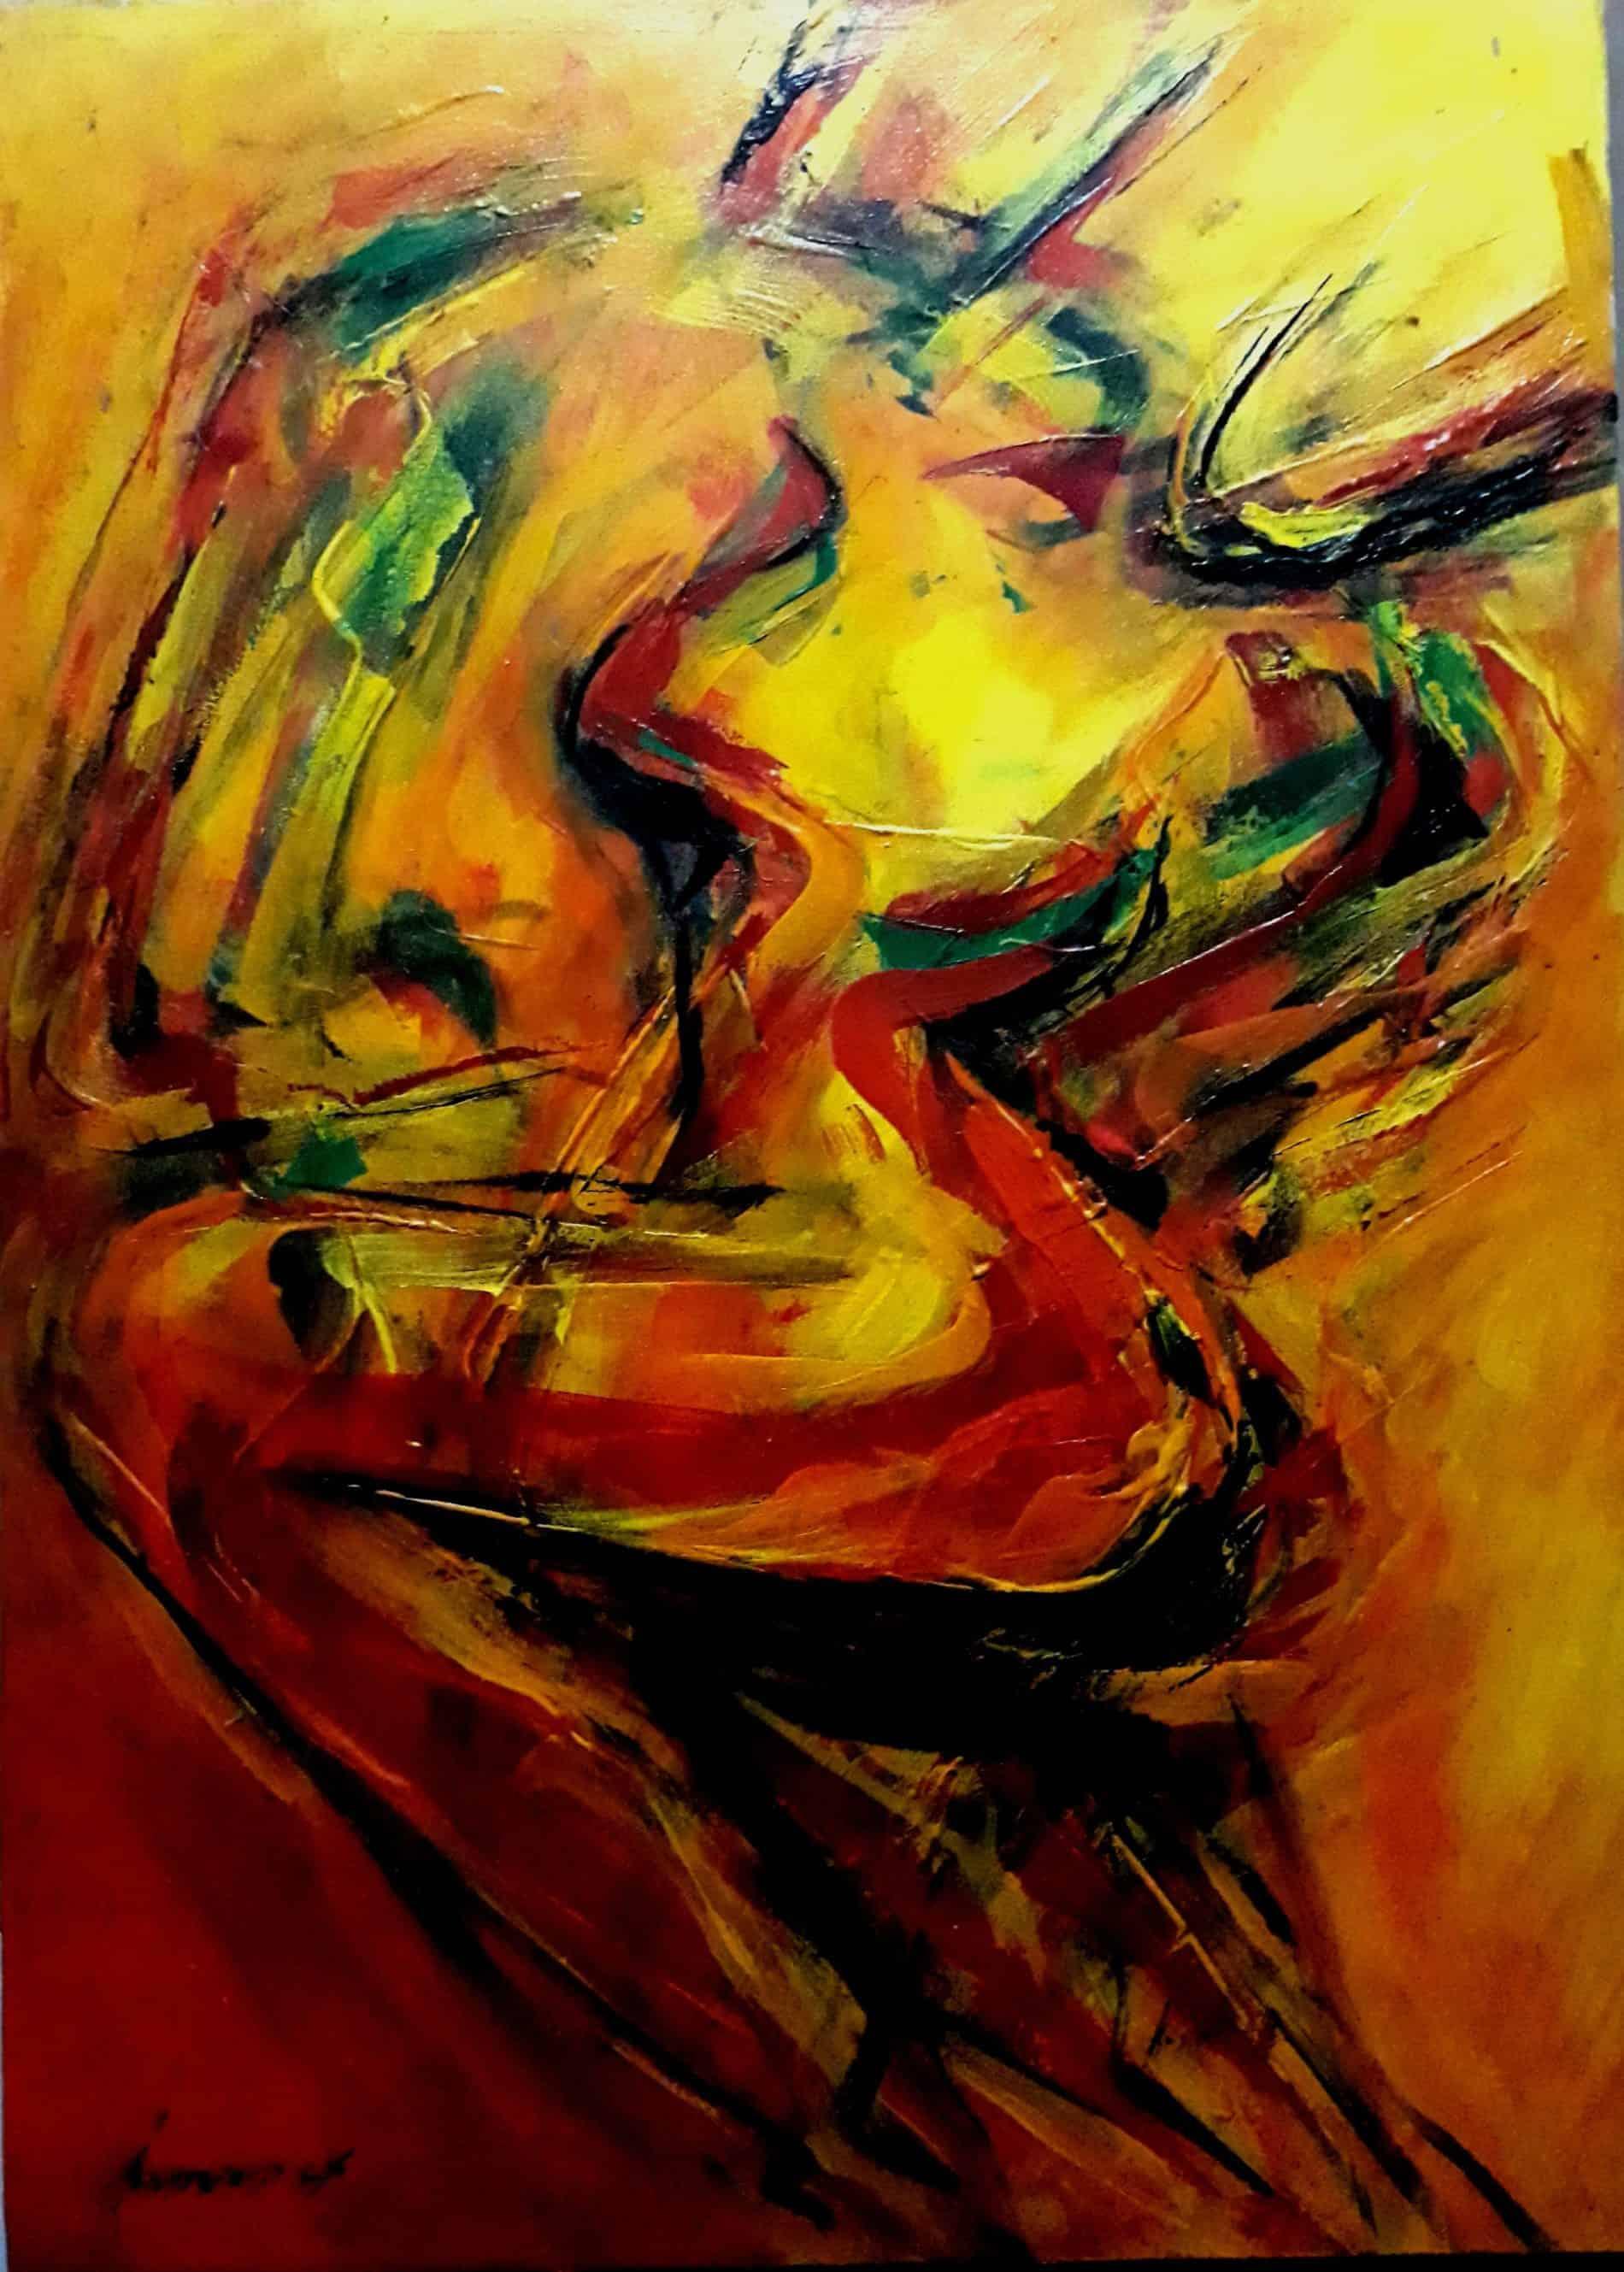 mauritius-arts-together-2